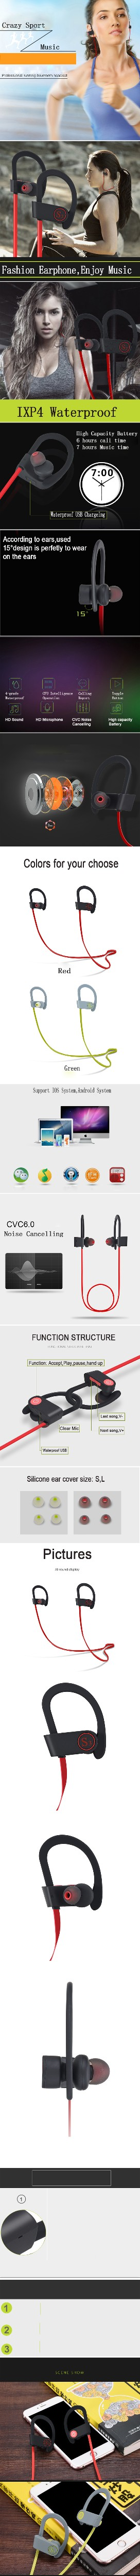 Stereo bluetooth earphone waterproof sport wireless mini headphones for xiomi iphone handsfree earpiece with microphone headset